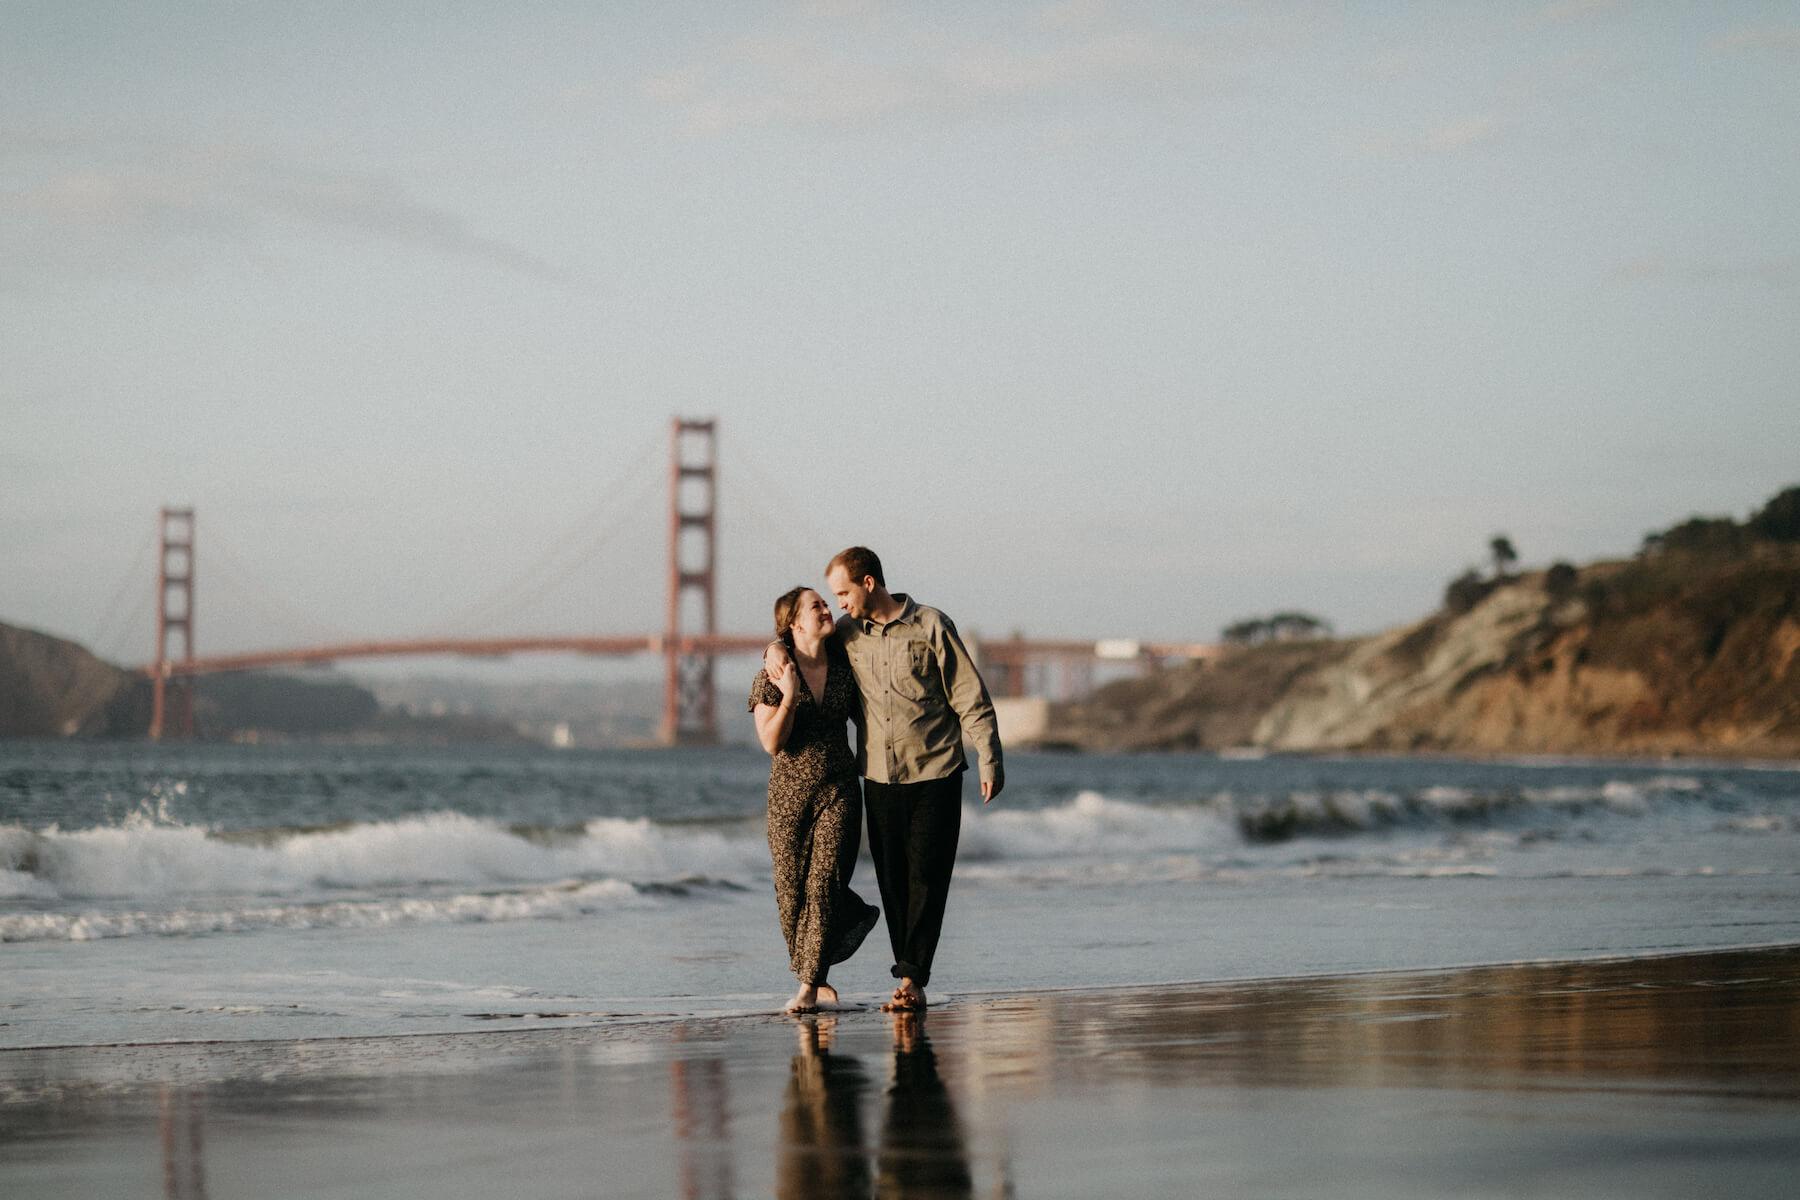 san-francisco-09-29-2019-couples-trip-29_original